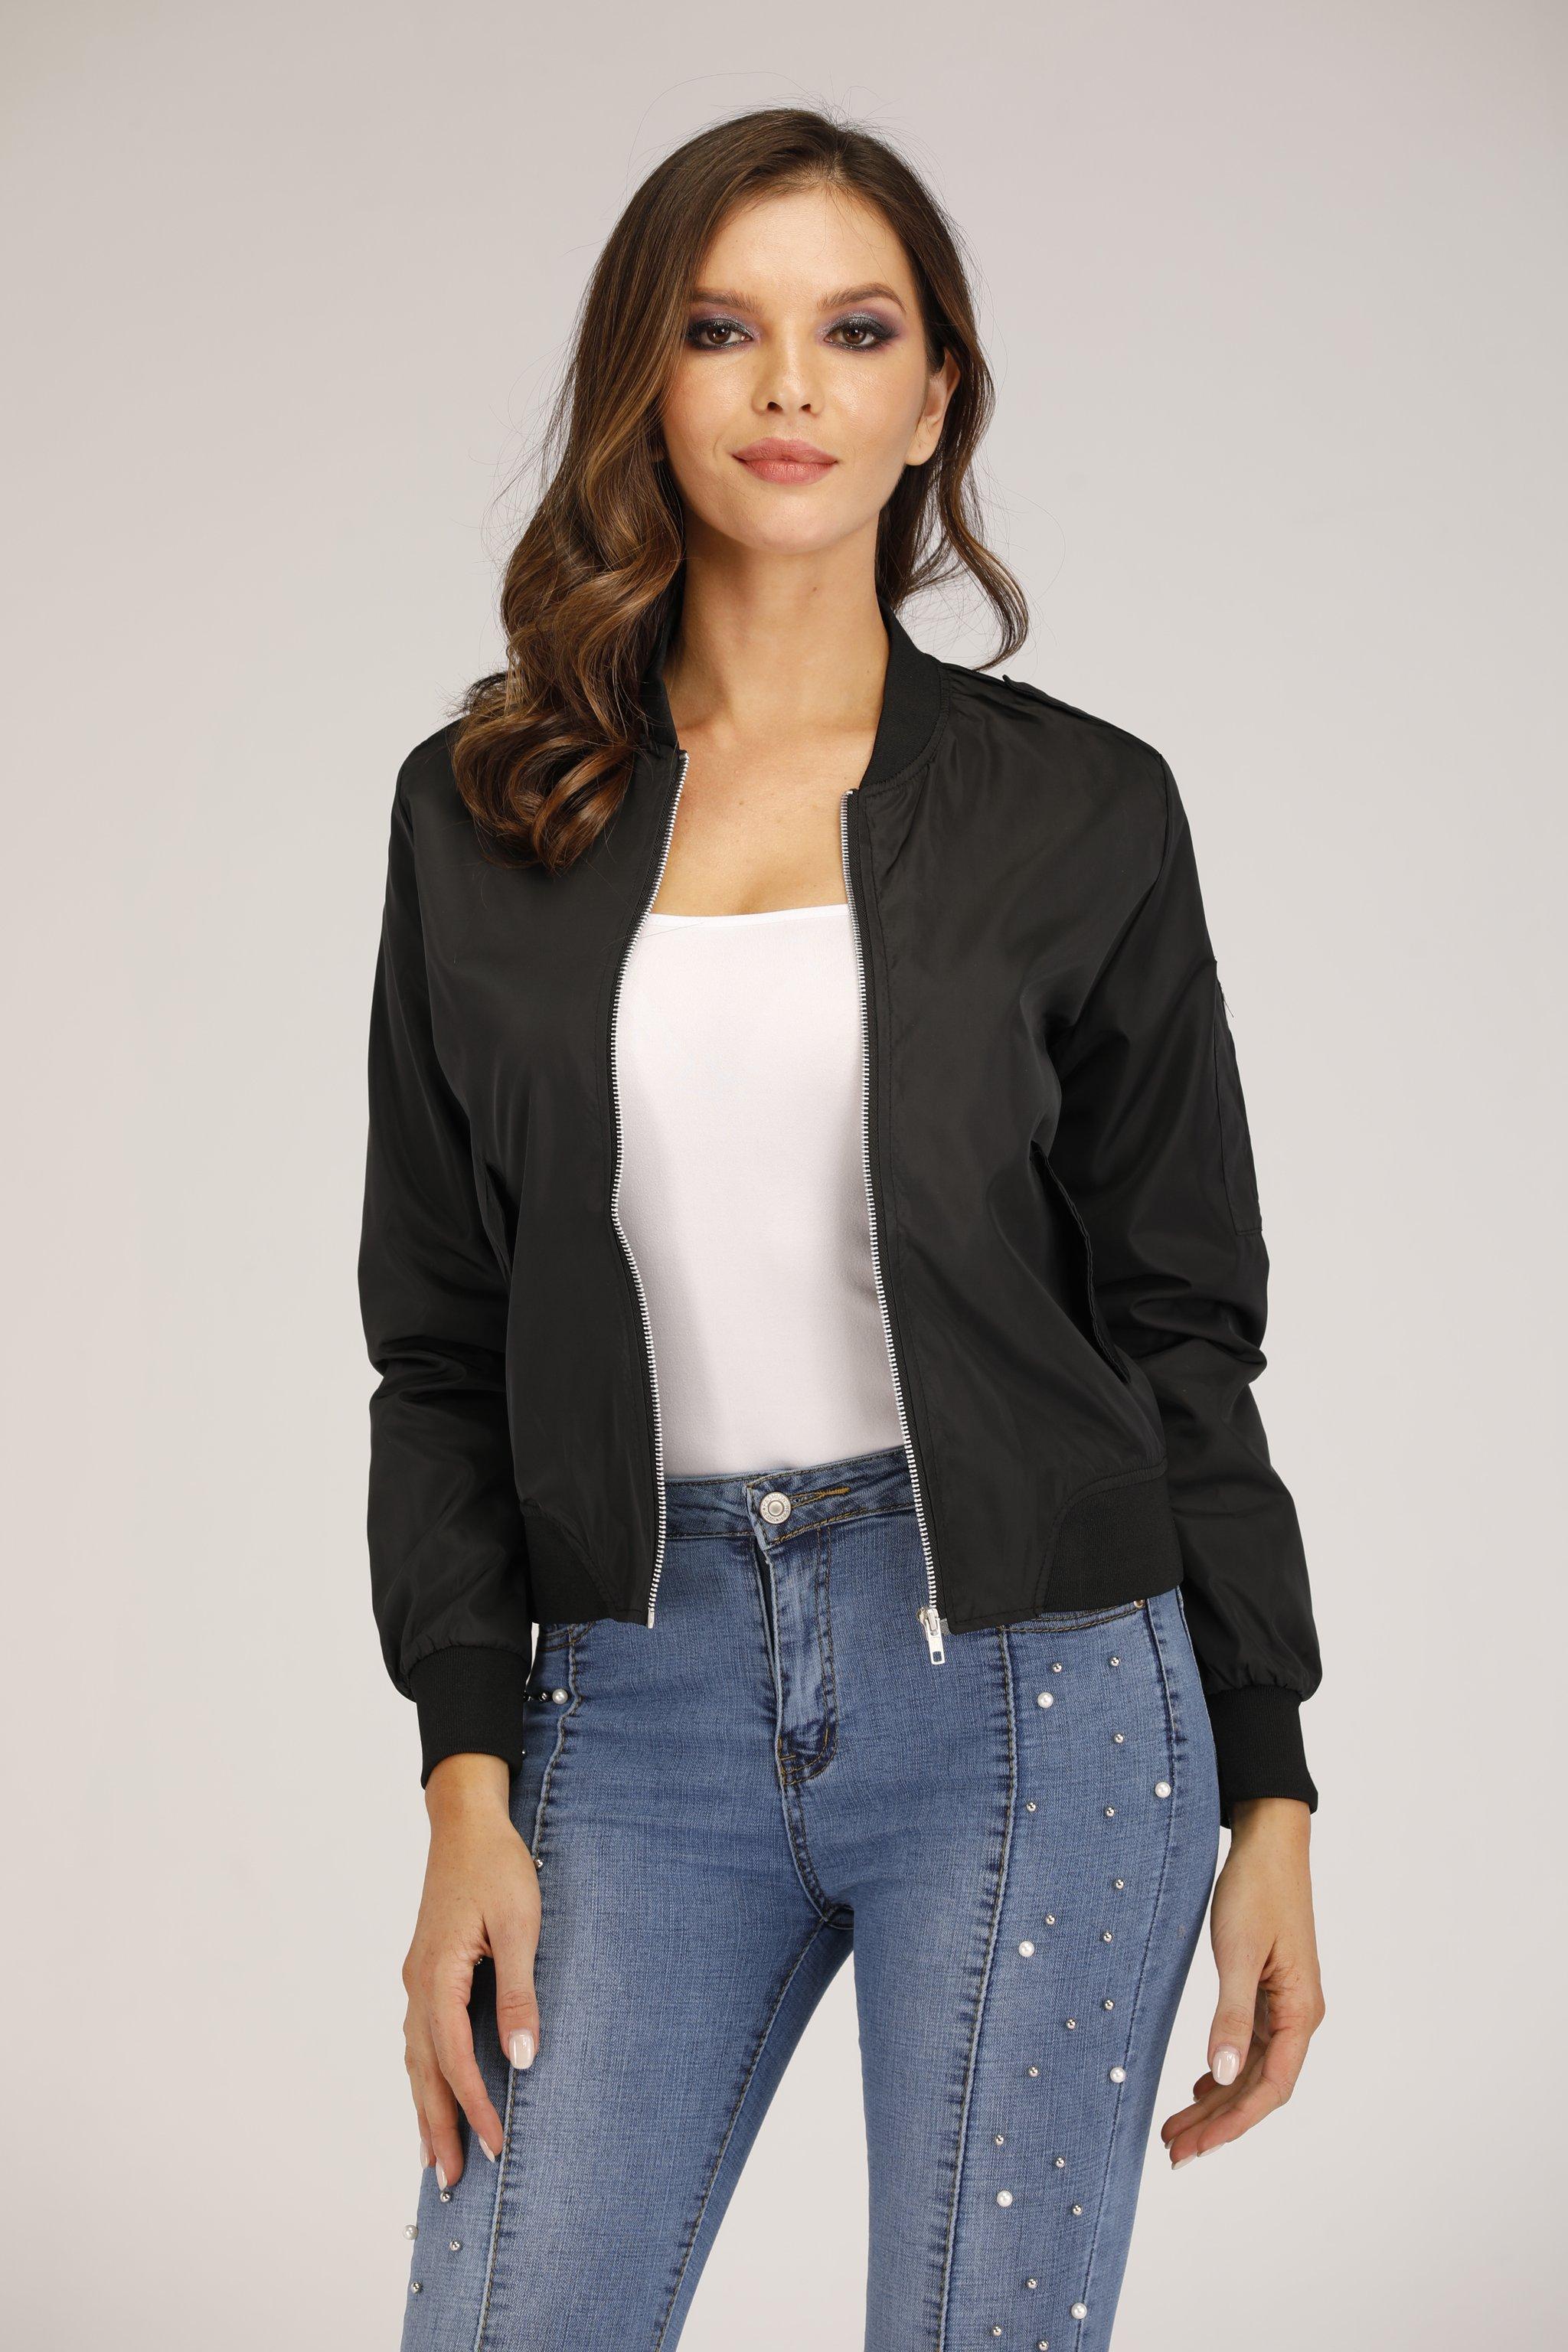 Mantra Black Bomber Jacket for womens